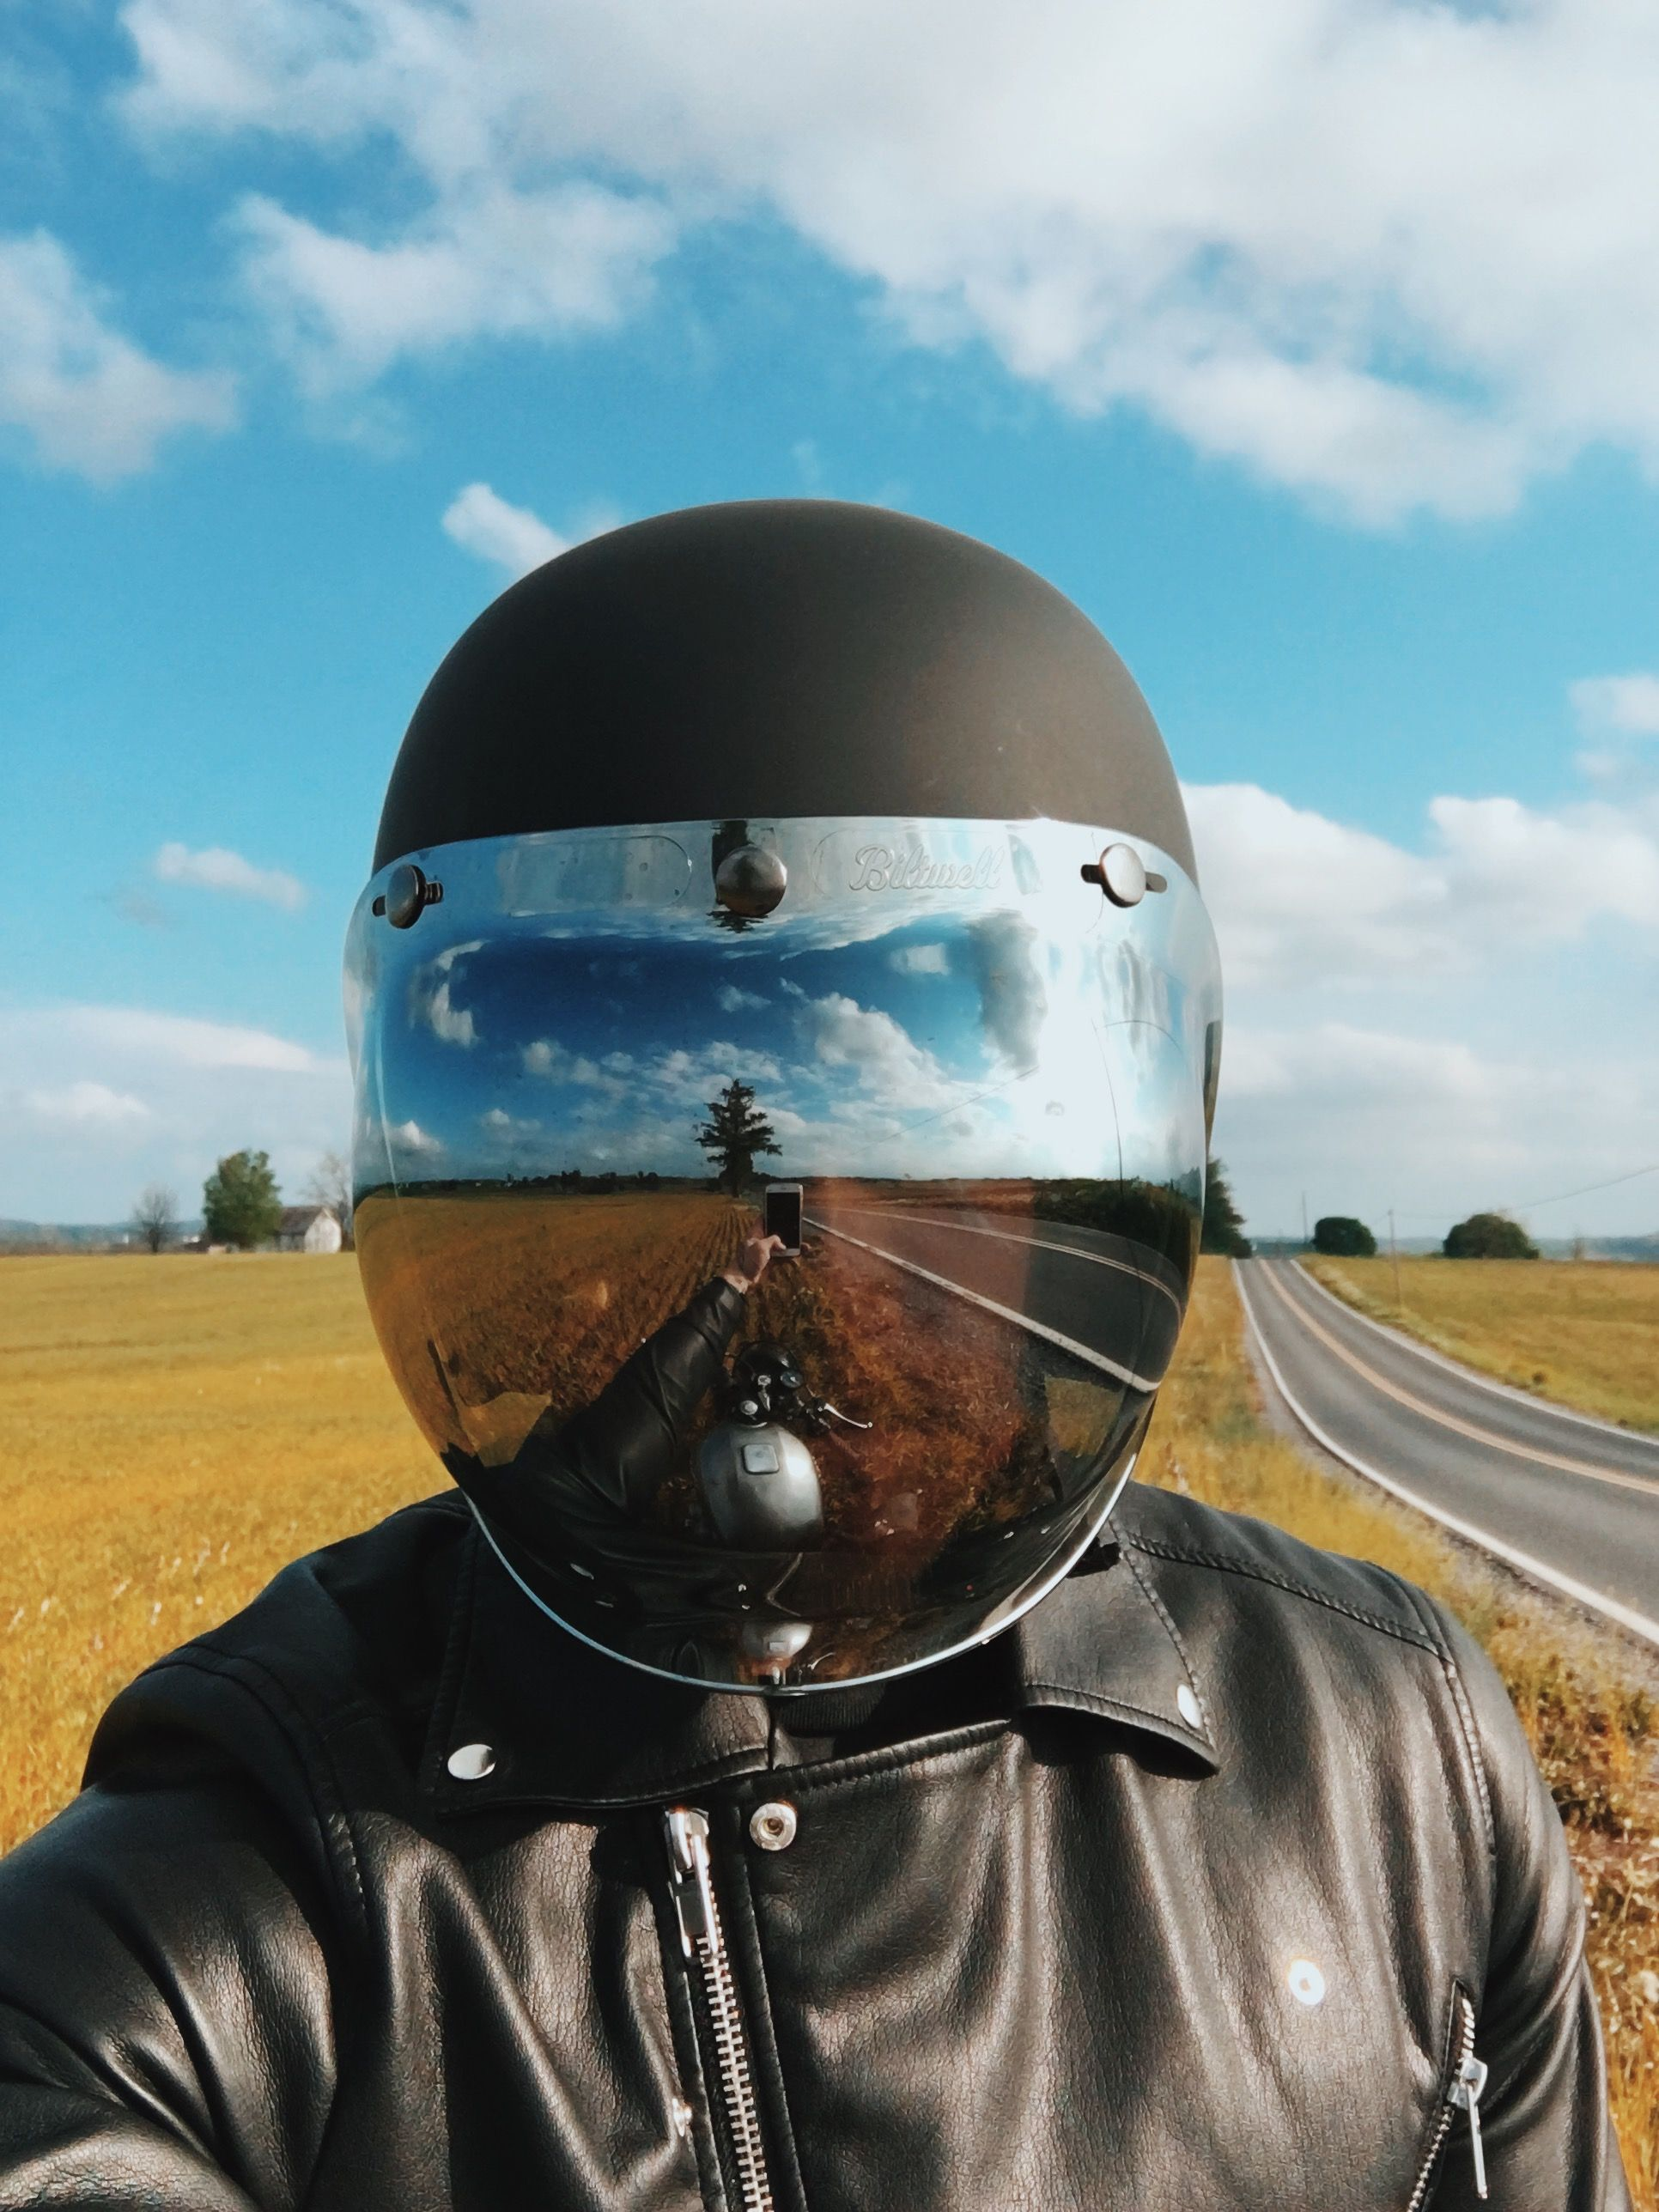 Картинка в шлеме